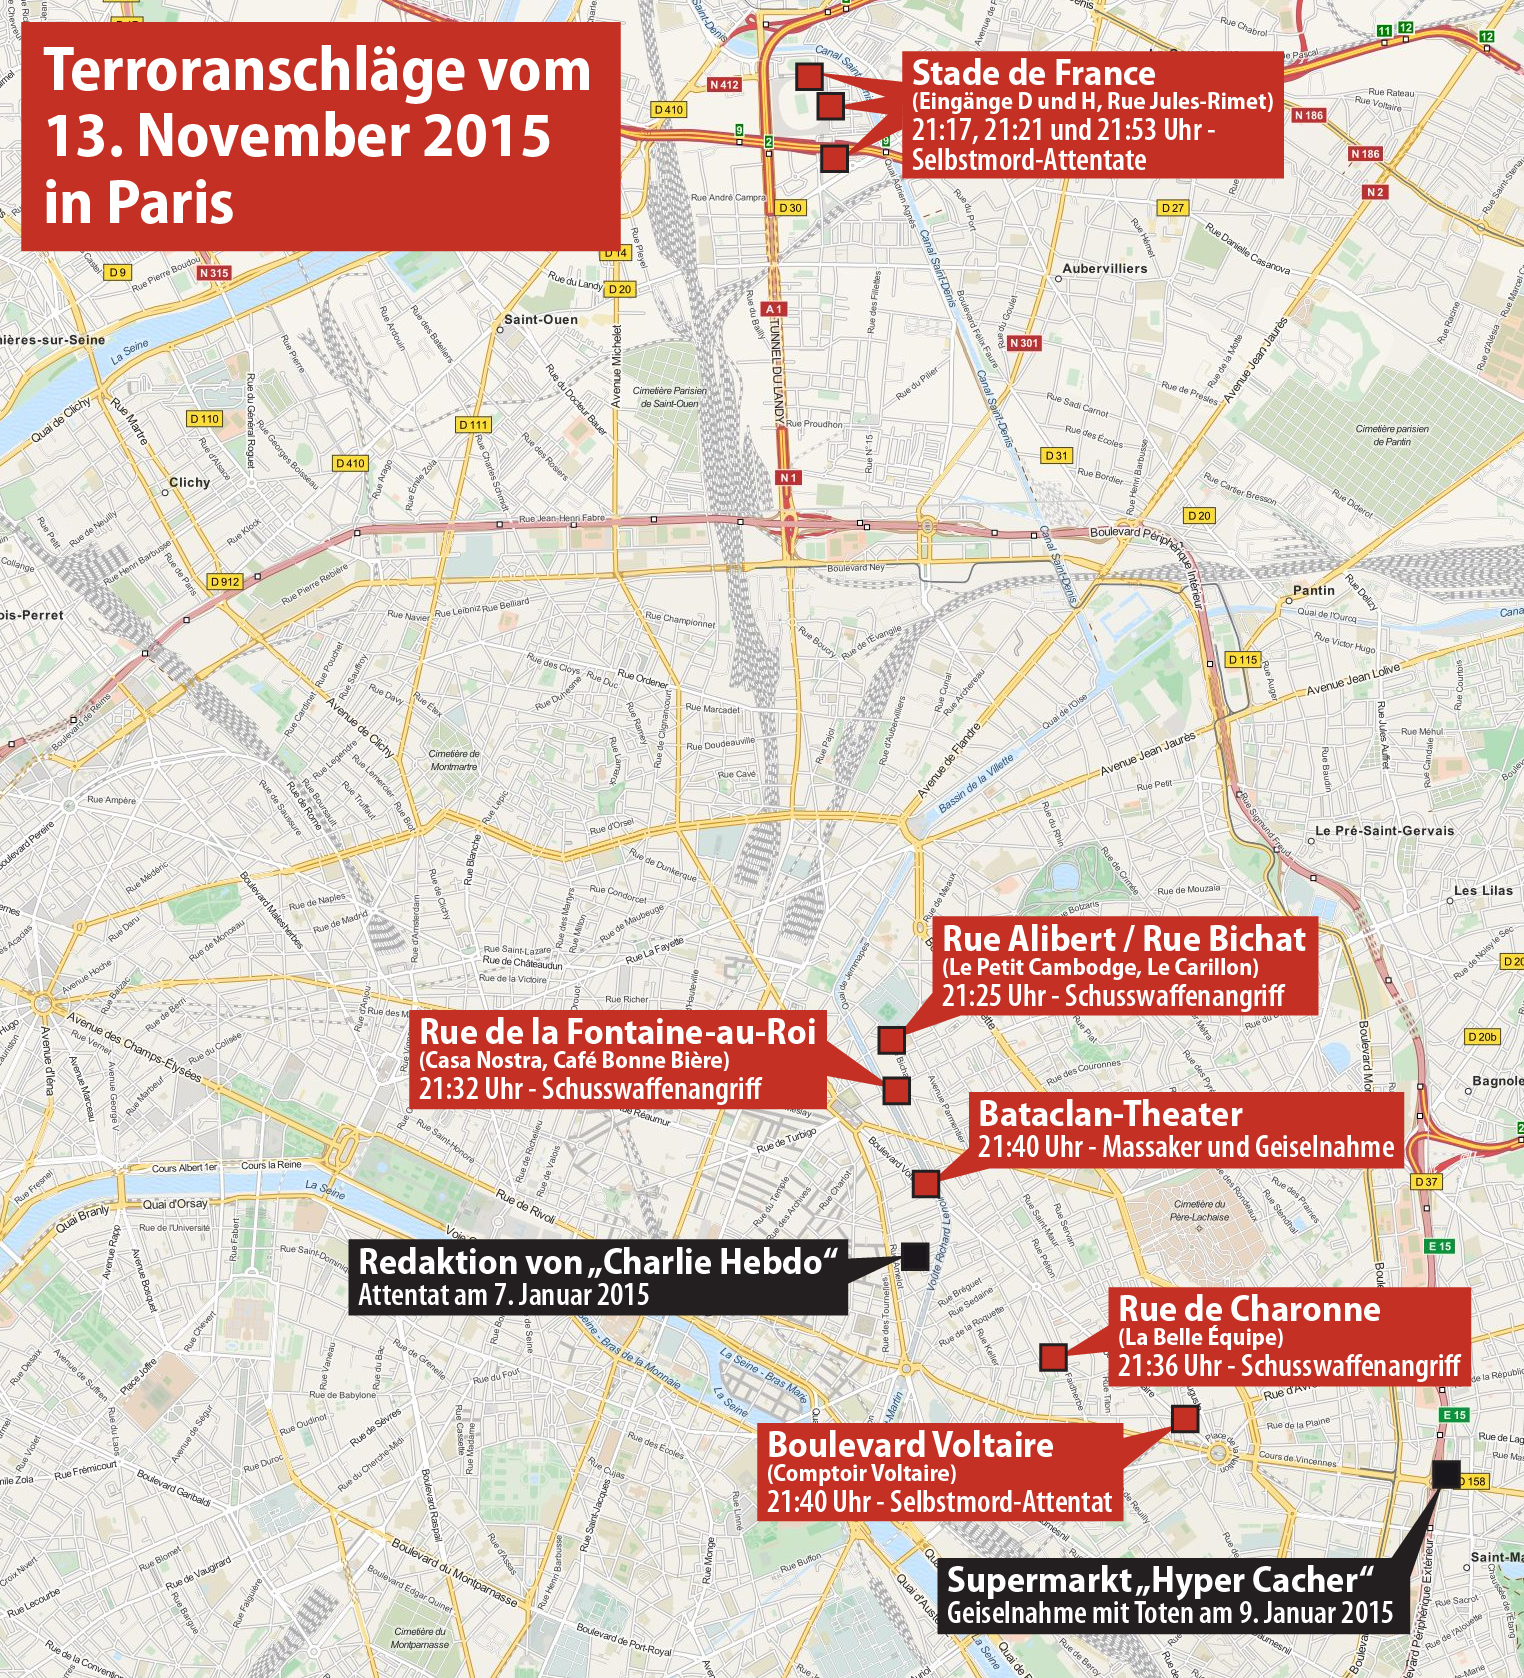 Orte der Anschläge in Paris vom 13./14. November 2015. (Quelle: Maximilian Dörrbecker via Wikimedia Commons unter Lizenz CC-BY-SA 2.0)